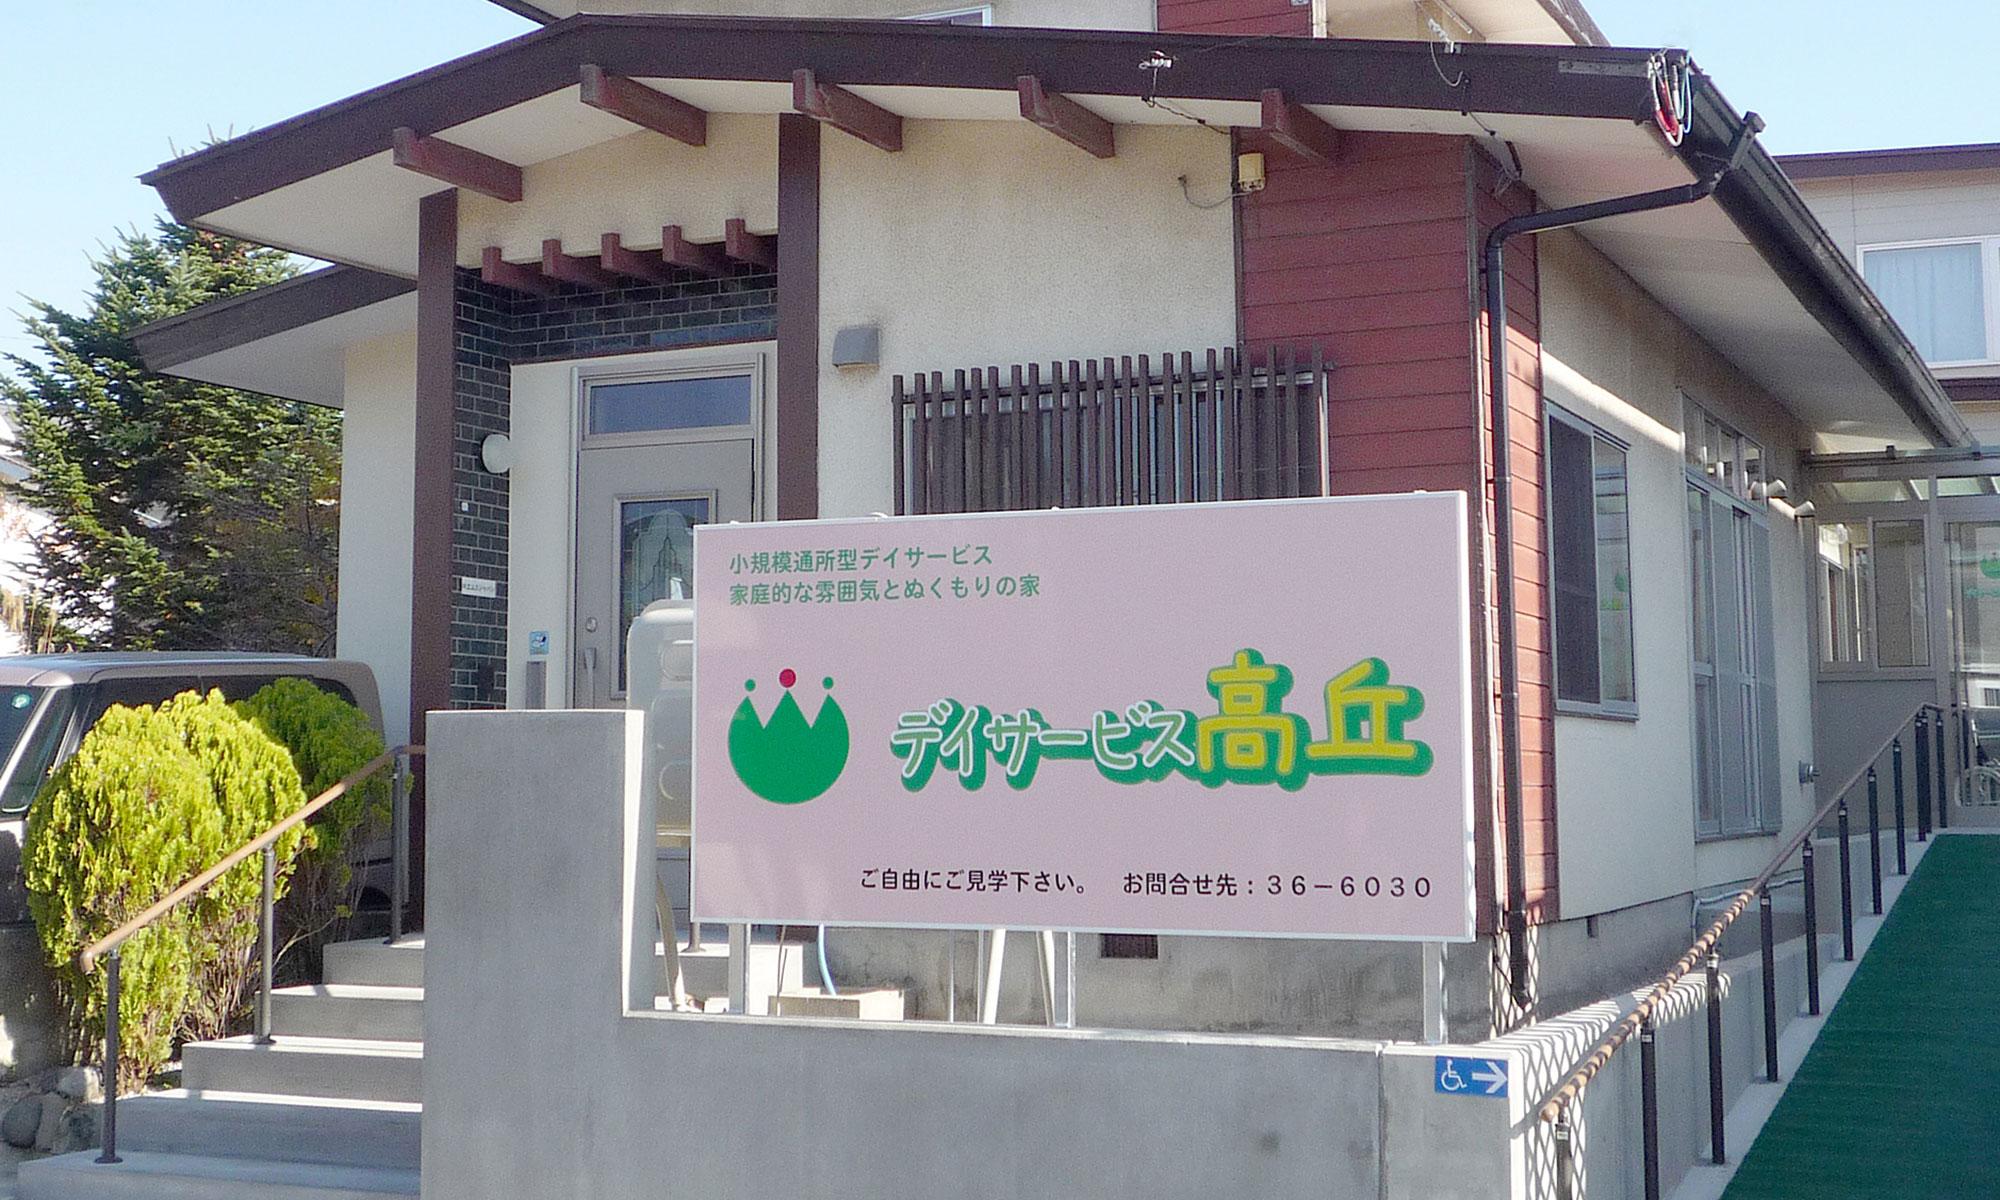 デイサービス高丘|函館市|地域密着型通所介護